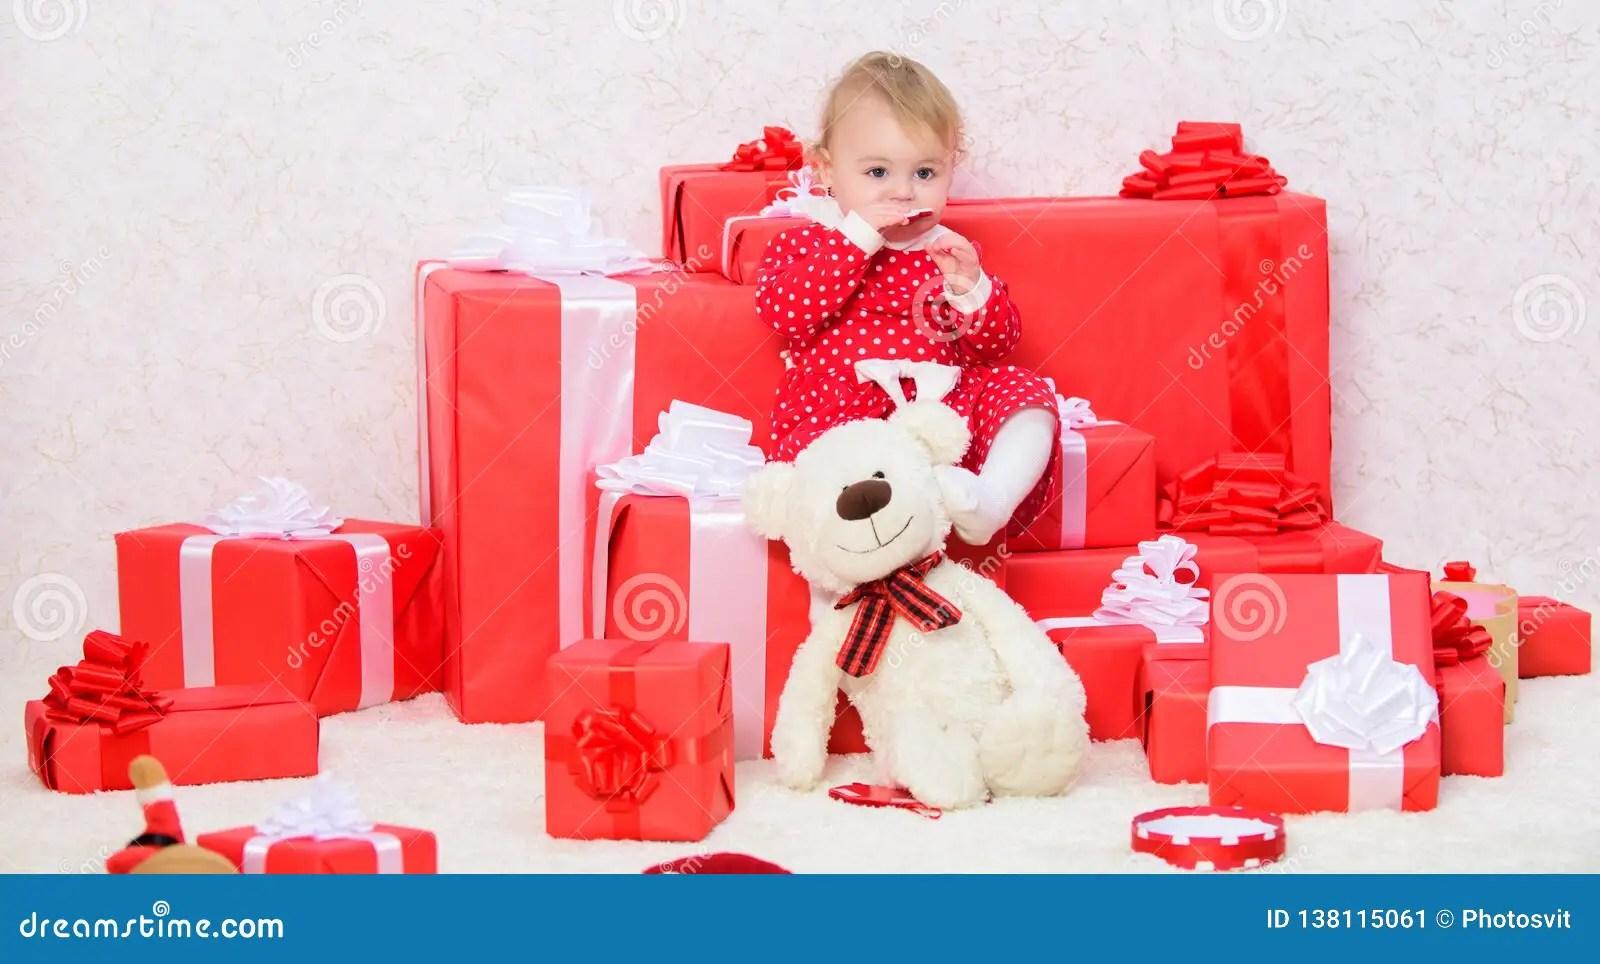 Christmas Gifts Baby